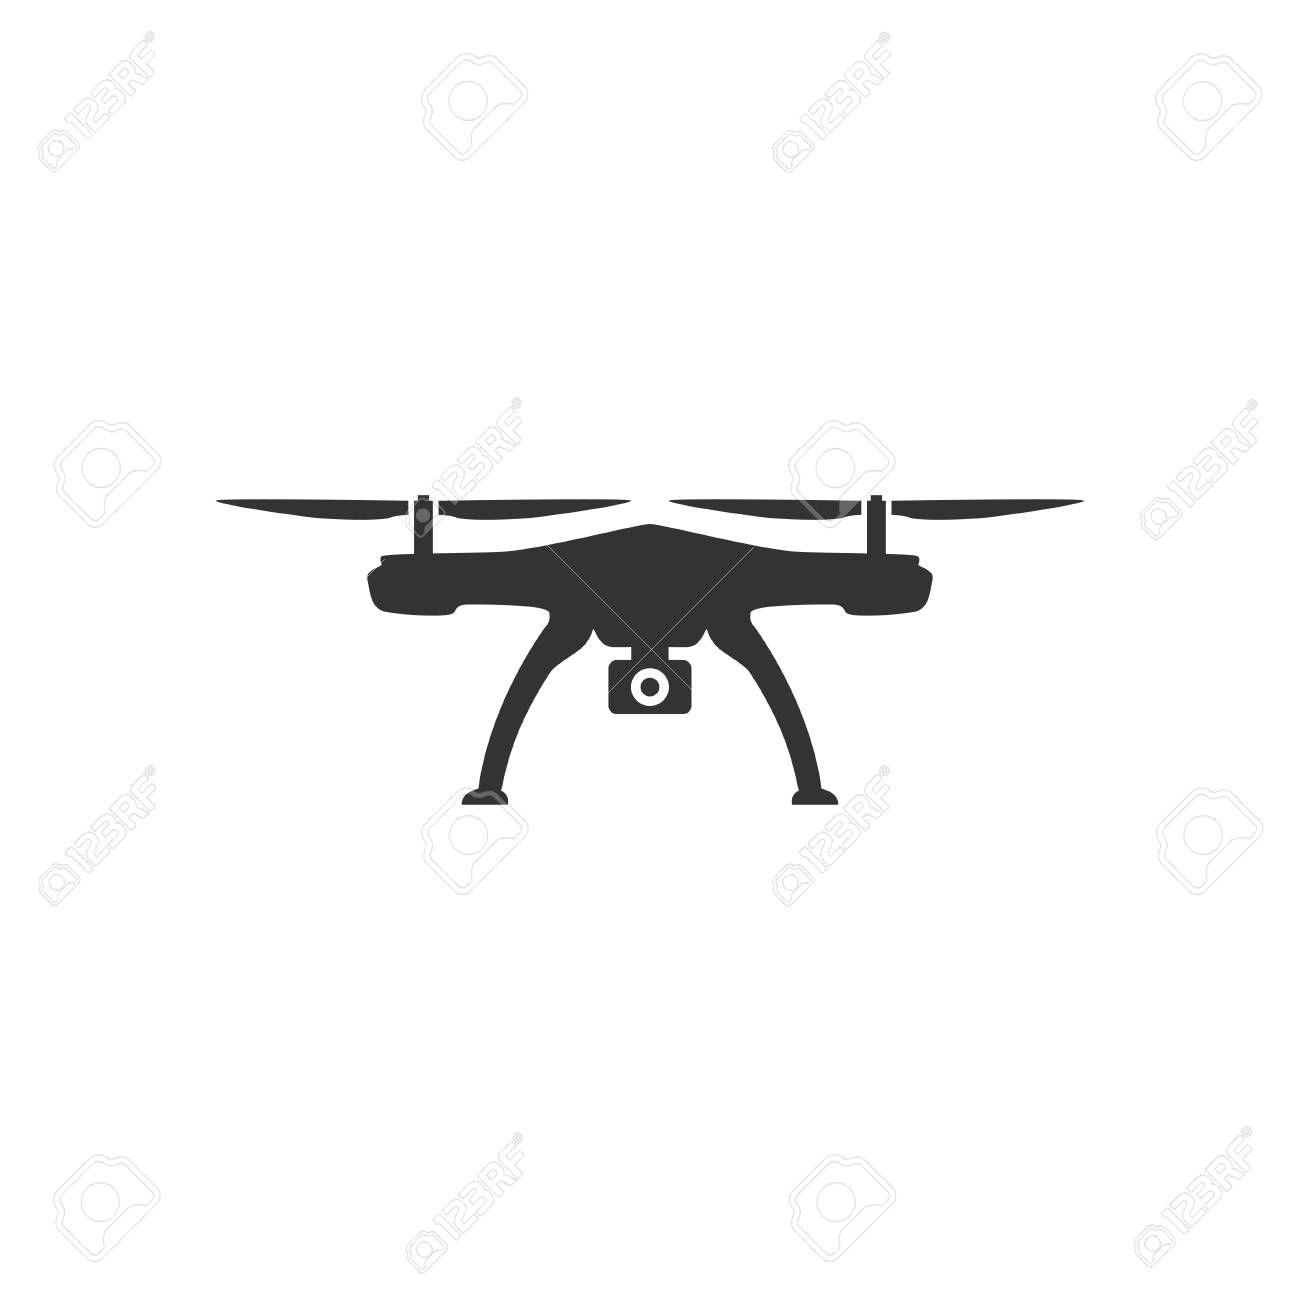 Drone Icon In Simple Design Vector Illustration Illustration Affiliate Simple Icon Drone Design Illustr Art Inspiration Design Design Inspiration